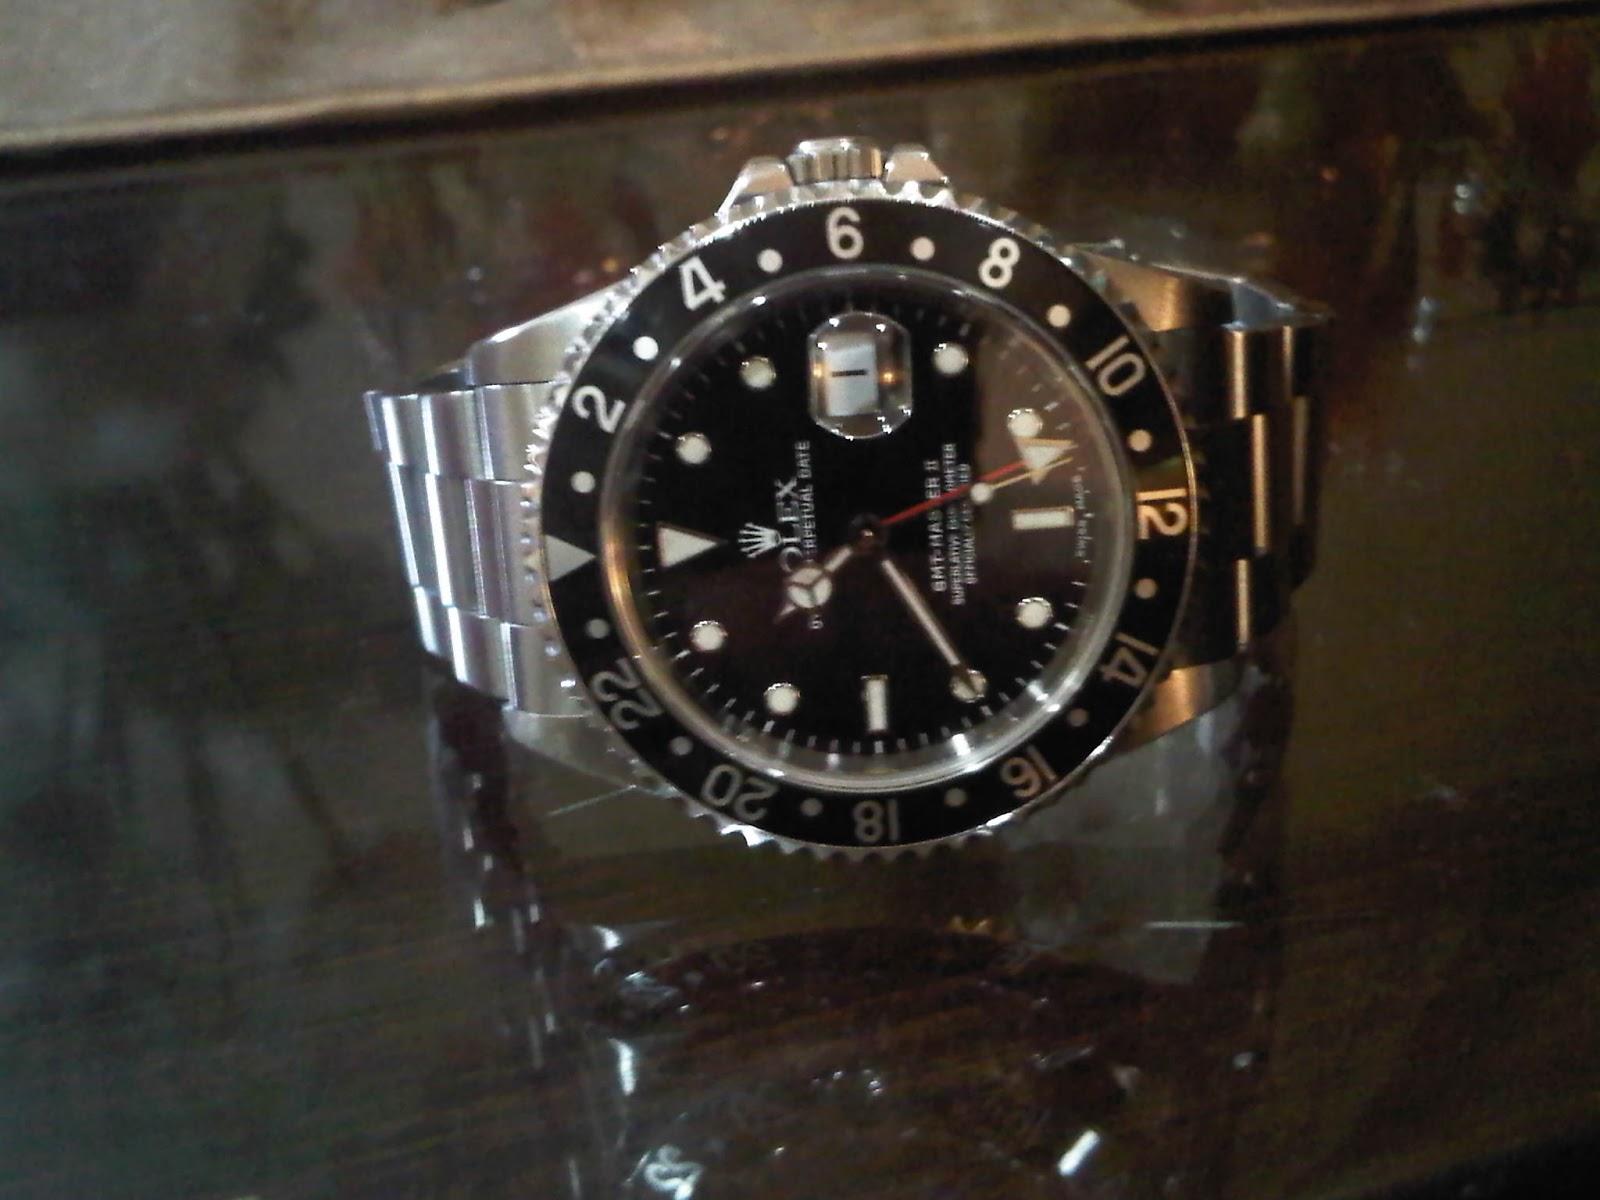 sale $ koleksi jam: Rolex GMT MAster II (16710) tahun 1999